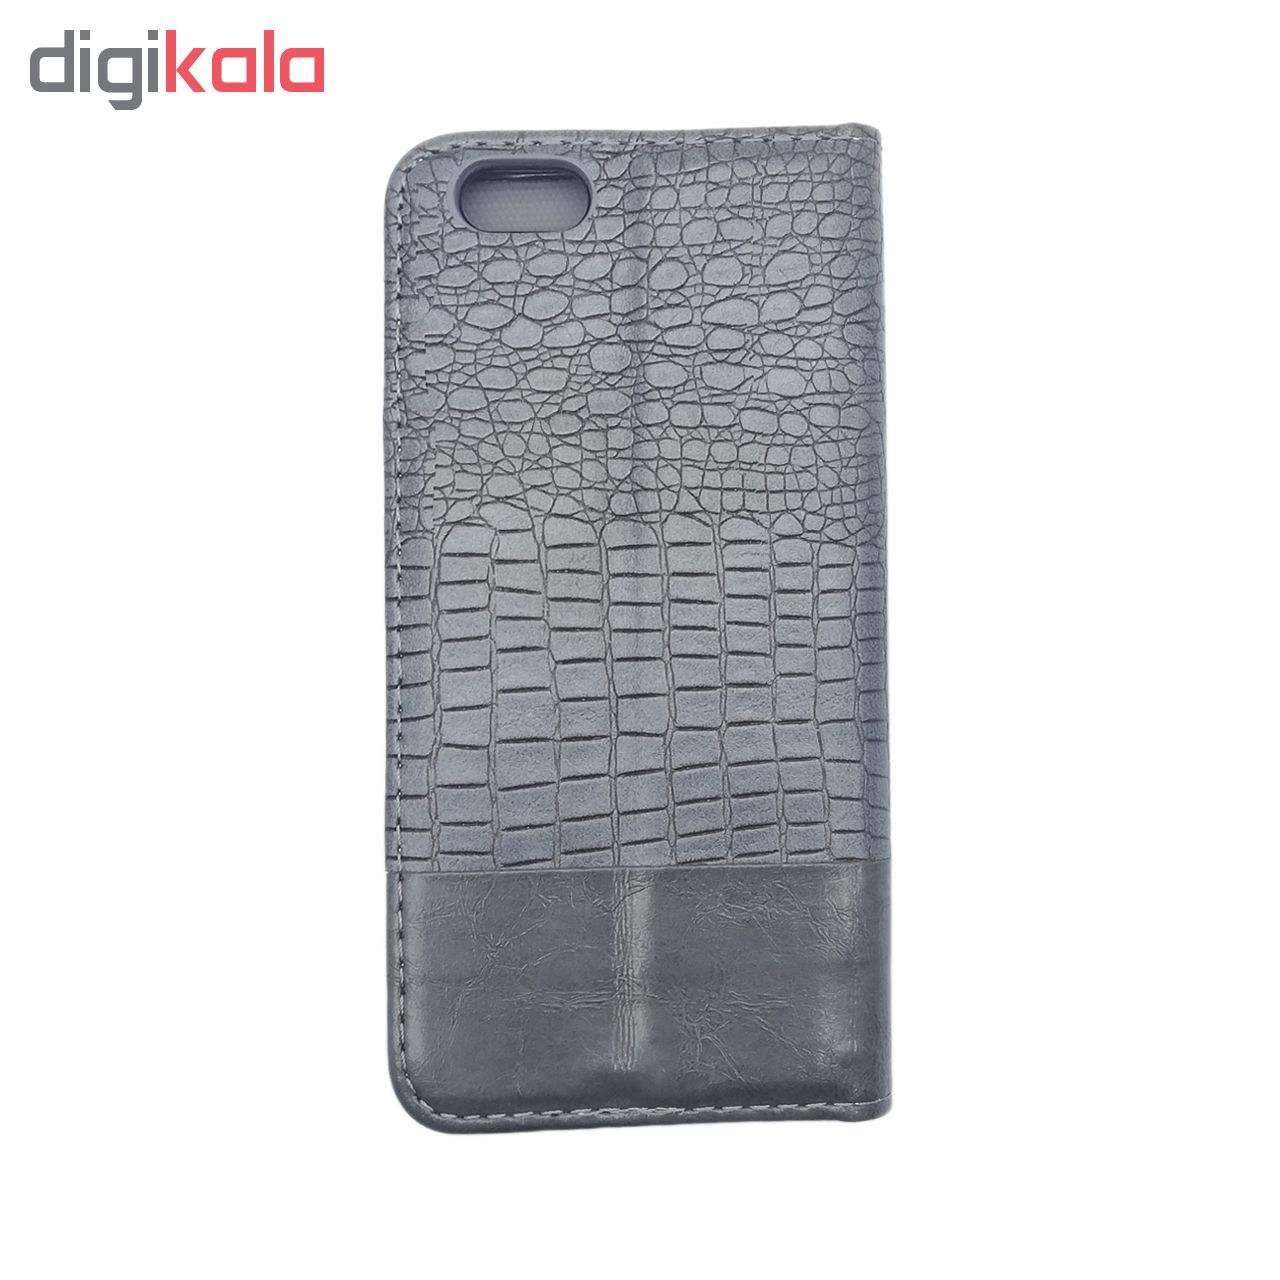 کیف کلاسوری مدل A2 مناسب برای گوشی موبایل اپل iphone 7/8 main 1 2